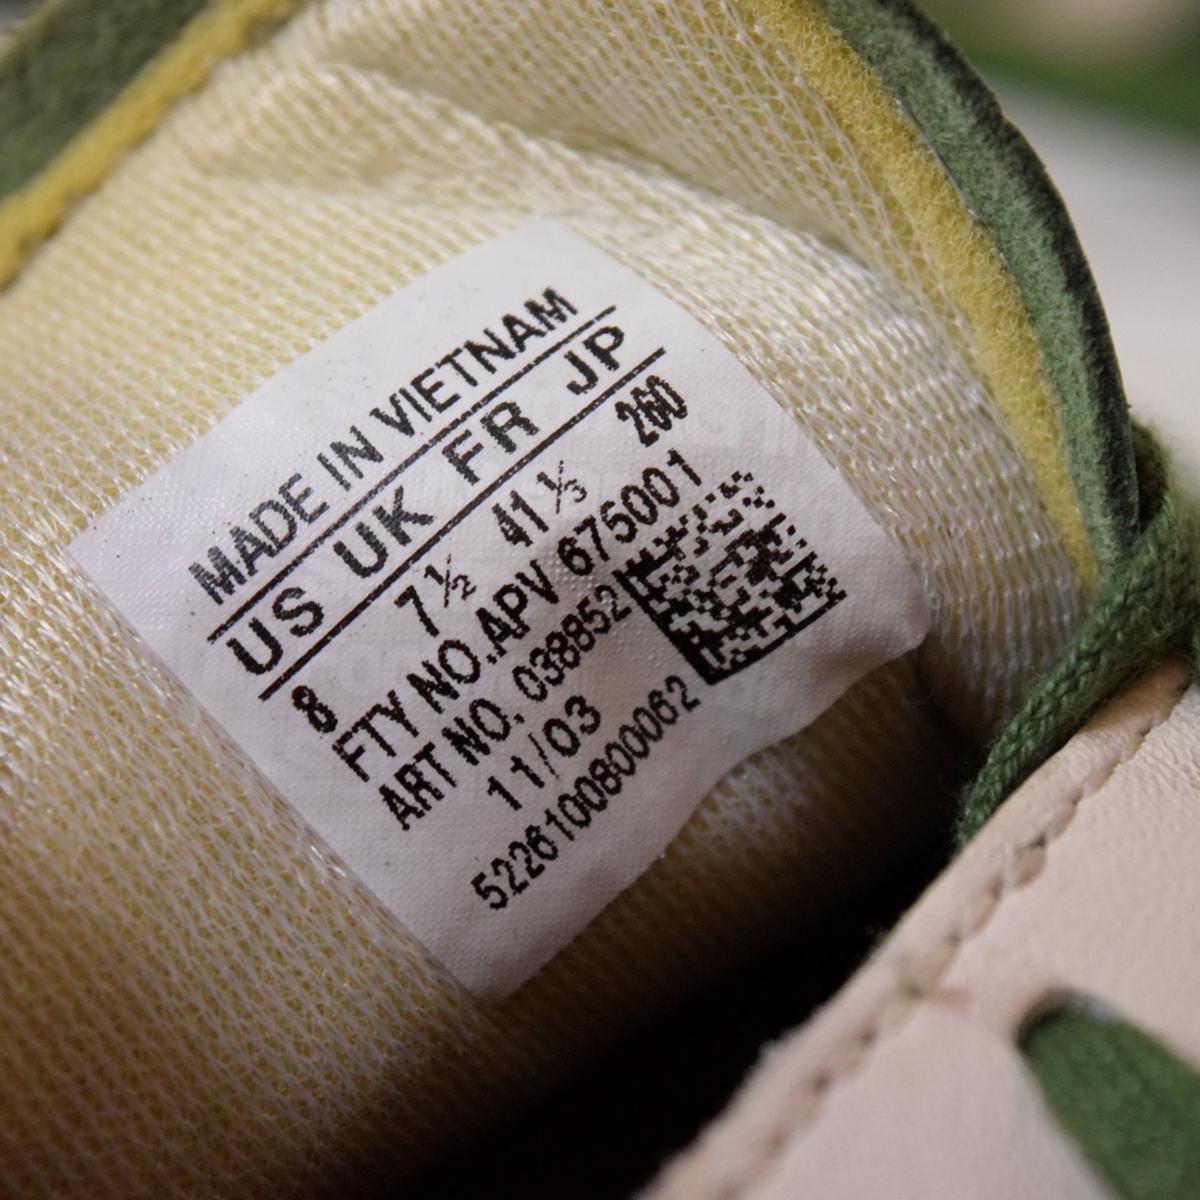 adidas アディダス ITALIA イタリア 26 スニーカー 都市 地名 2003年 復刻 緑 限定カラー_画像5